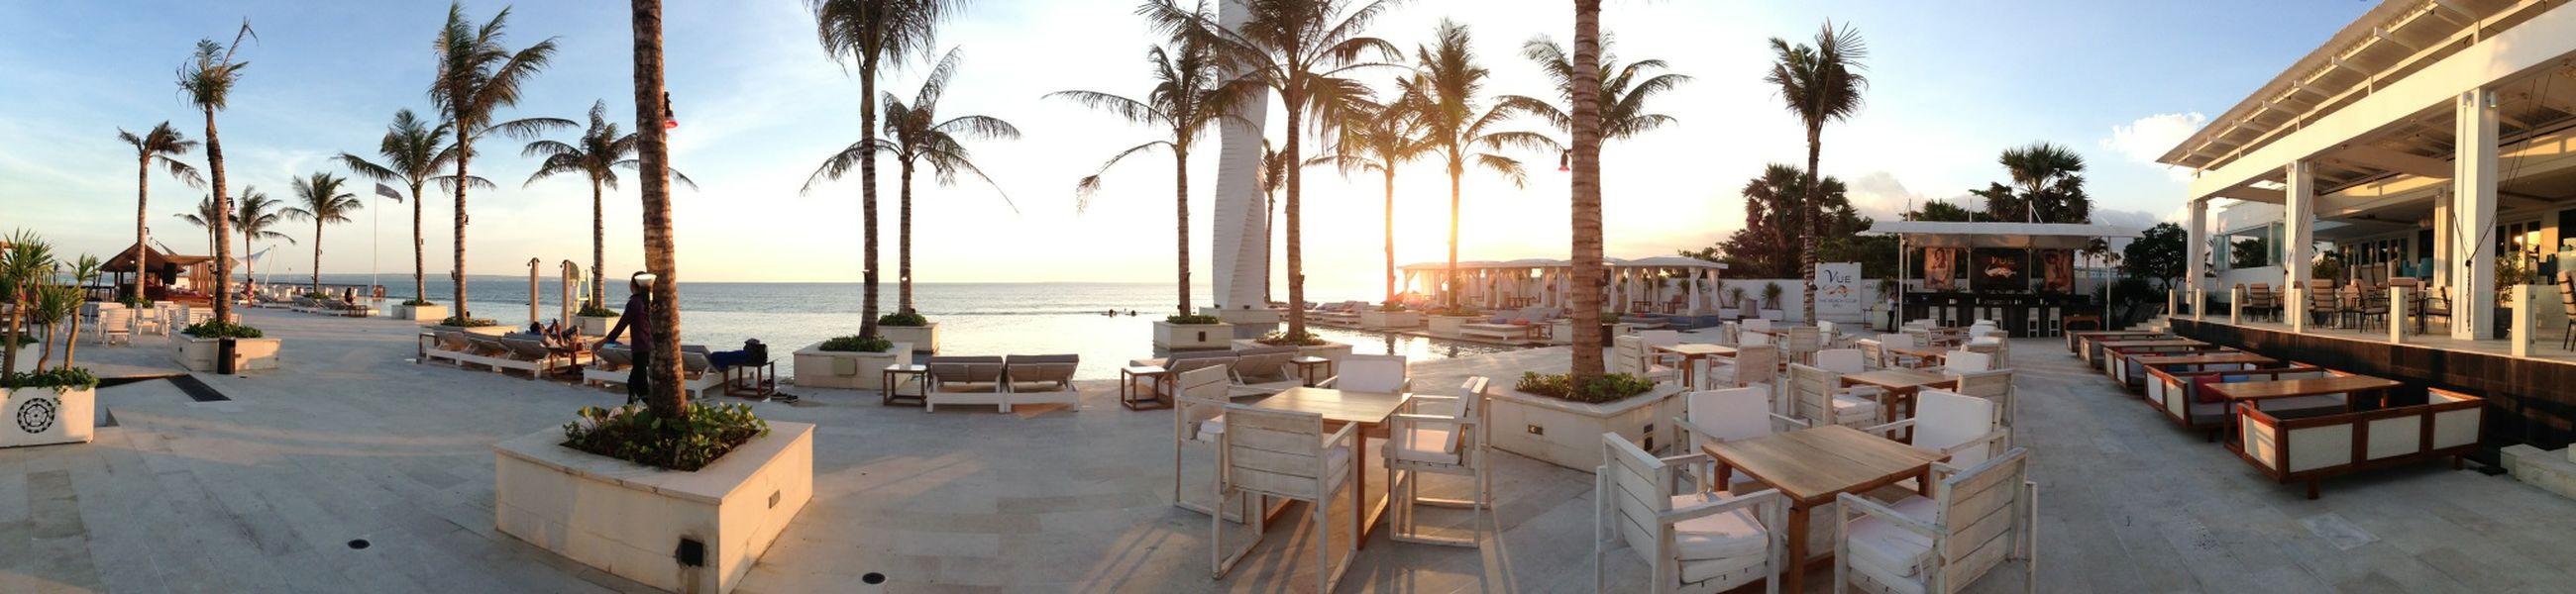 BEACH!  Club I❤BALi Enjoying The View